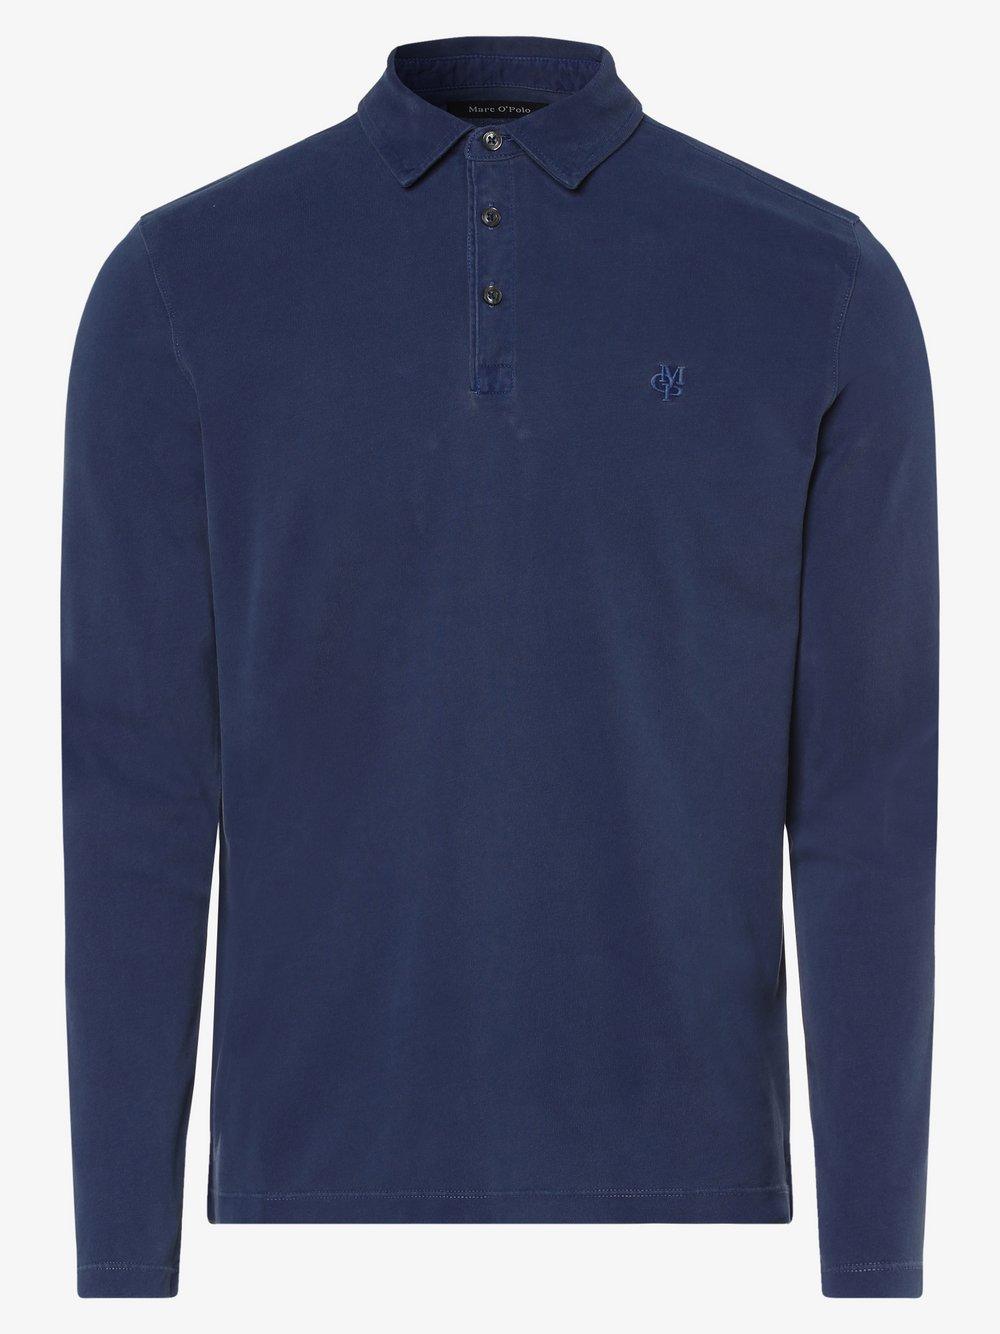 Marc O'Polo - Męska koszulka polo, niebieski